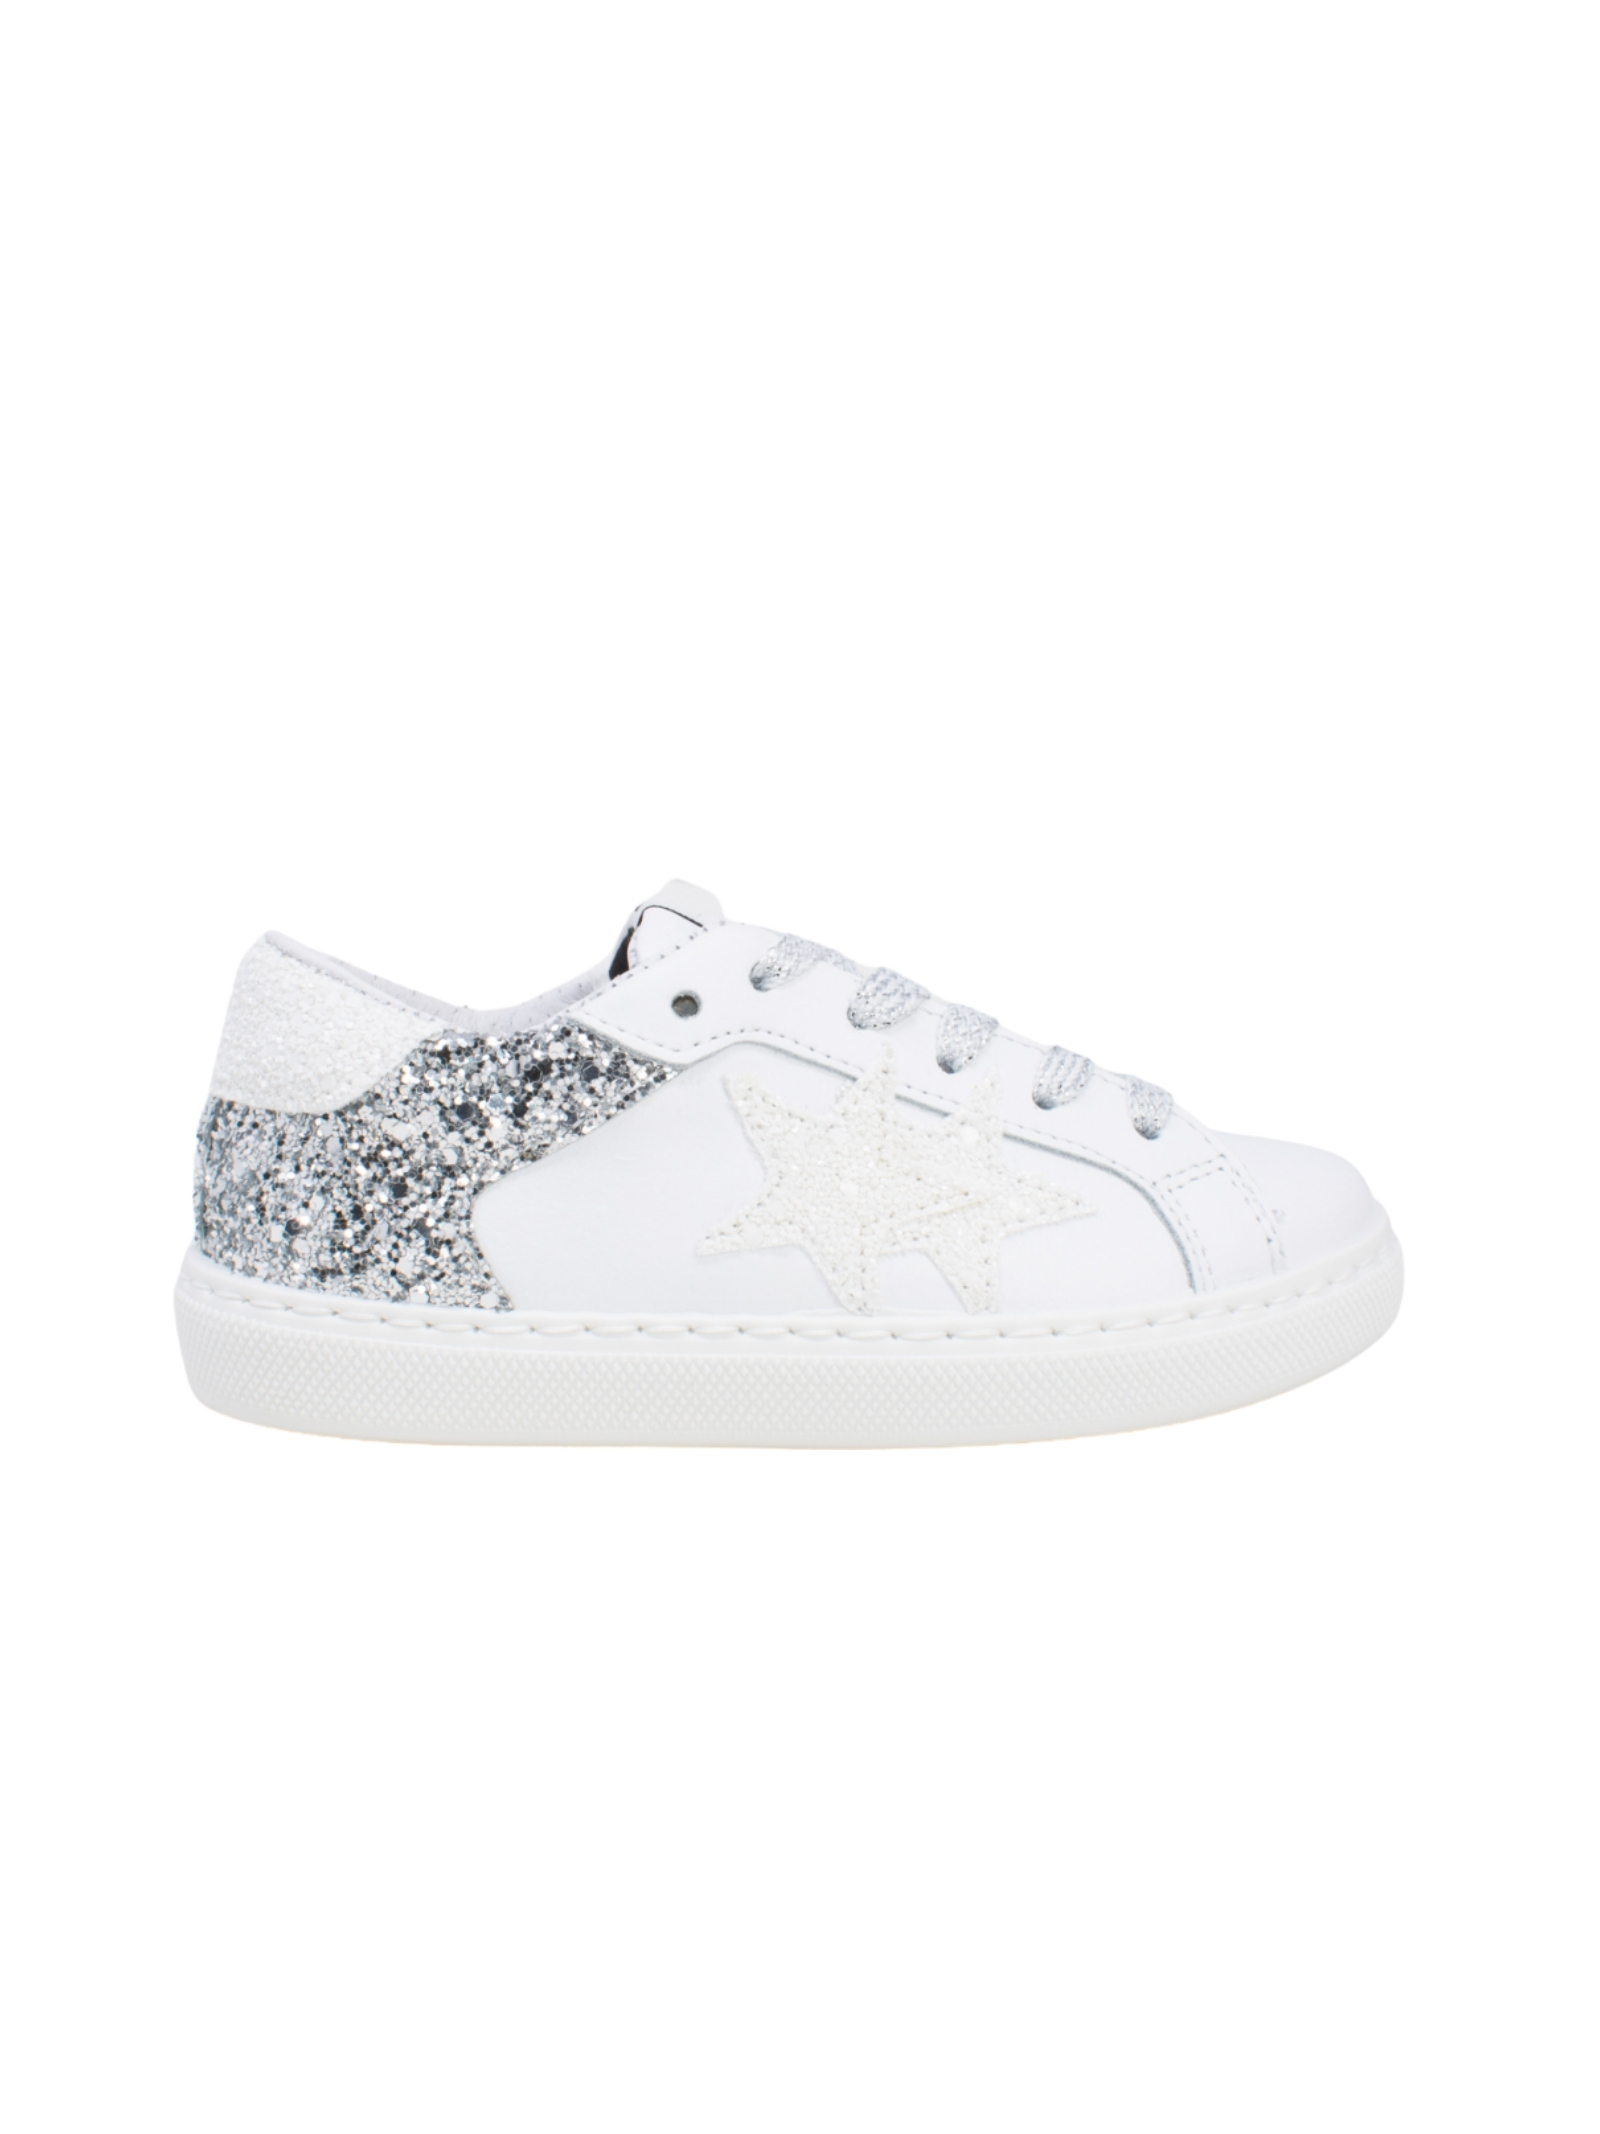 Sneakers Bambina Glitter 2STAR KIDS | Sneakers | 2SB2080004